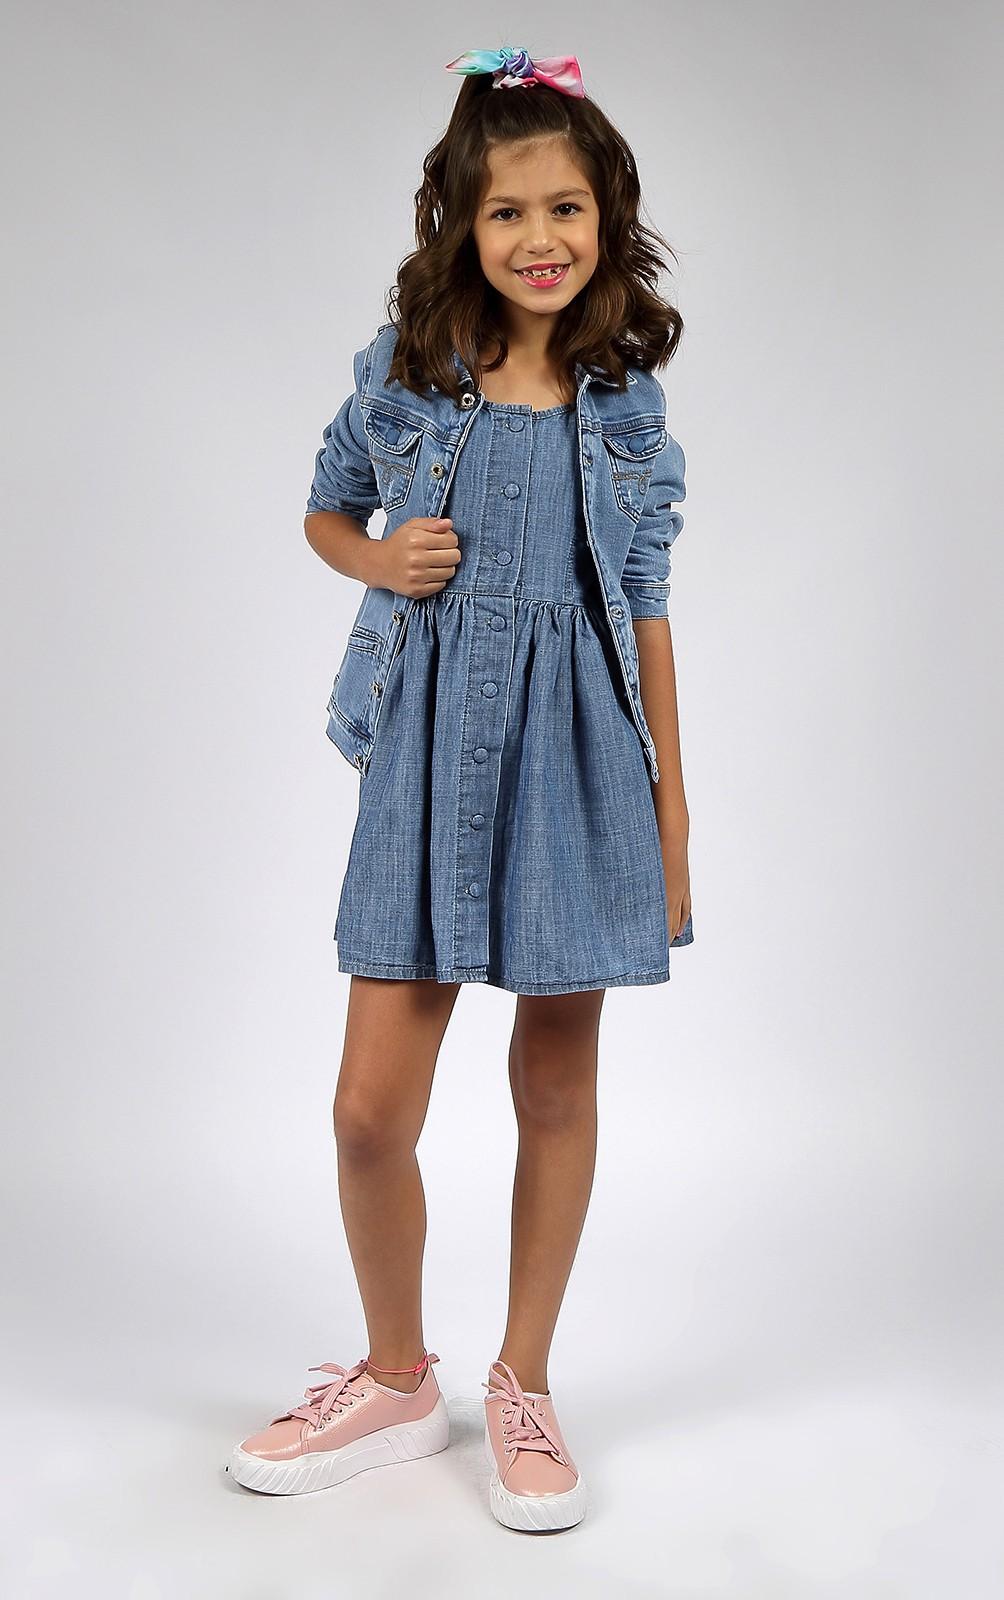 Vestido Infantil Feminino Crawling Jeans